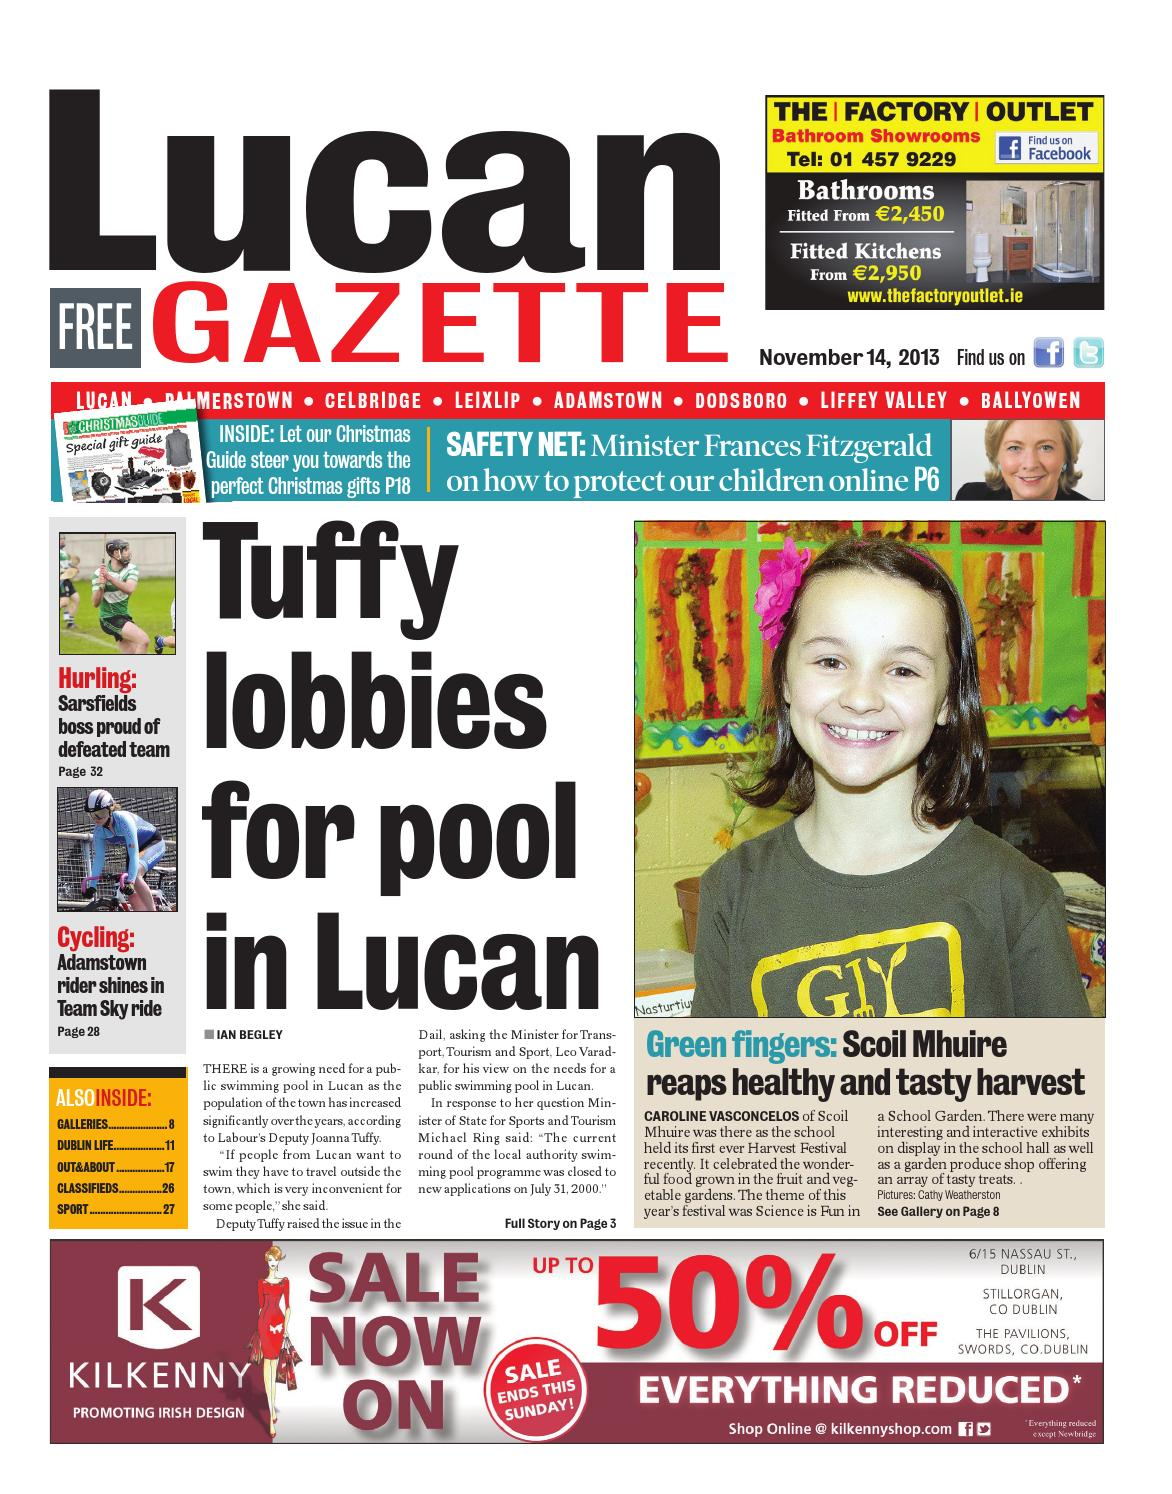 Lucan Gay Personals, Lucan Gay Dating Site, Lucan Gay